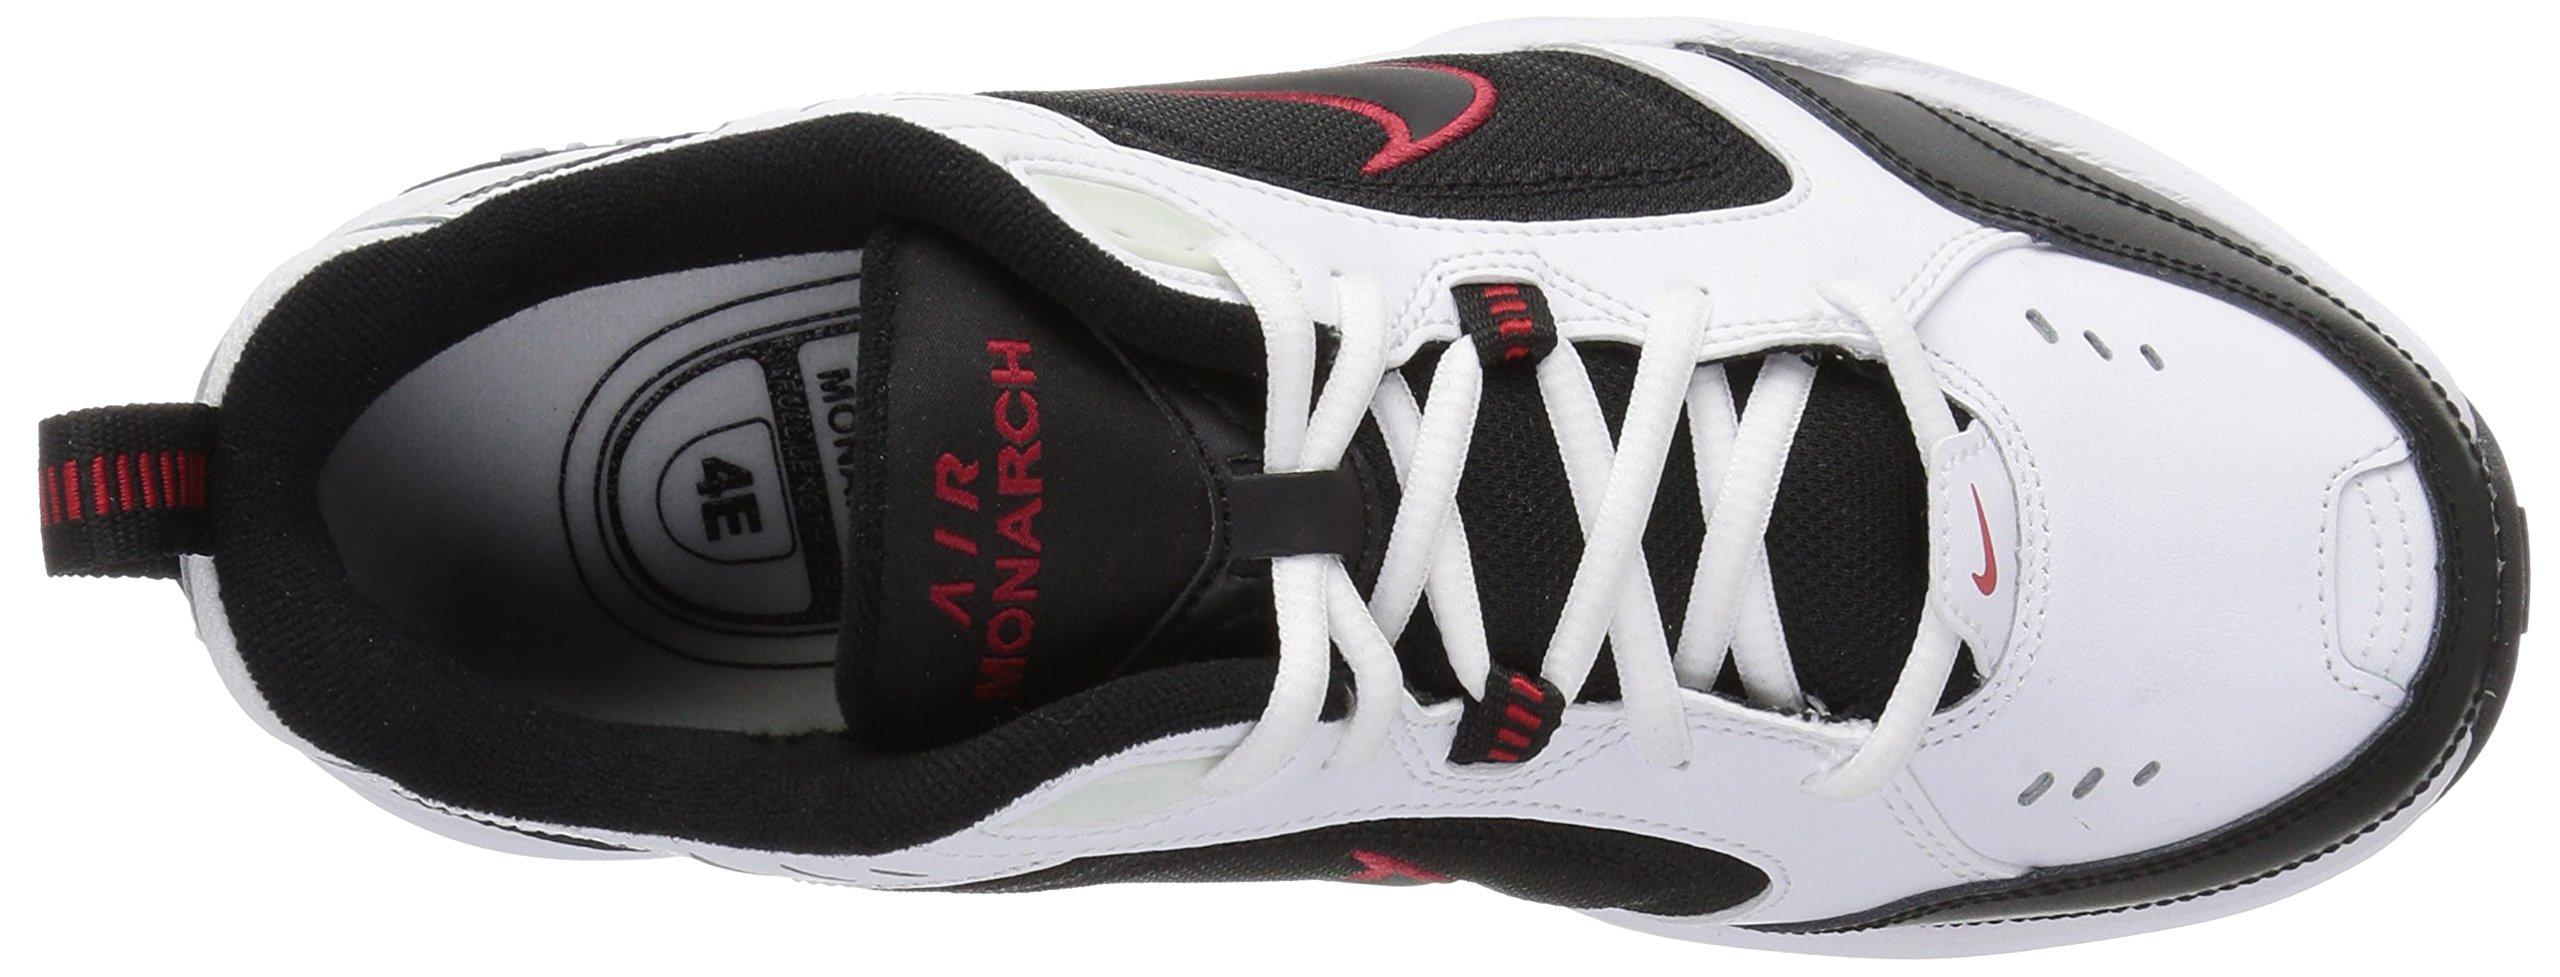 Nike Men's Air Monarch IV Cross Trainer, White/Black, 6.0 Regular US by Nike (Image #7)